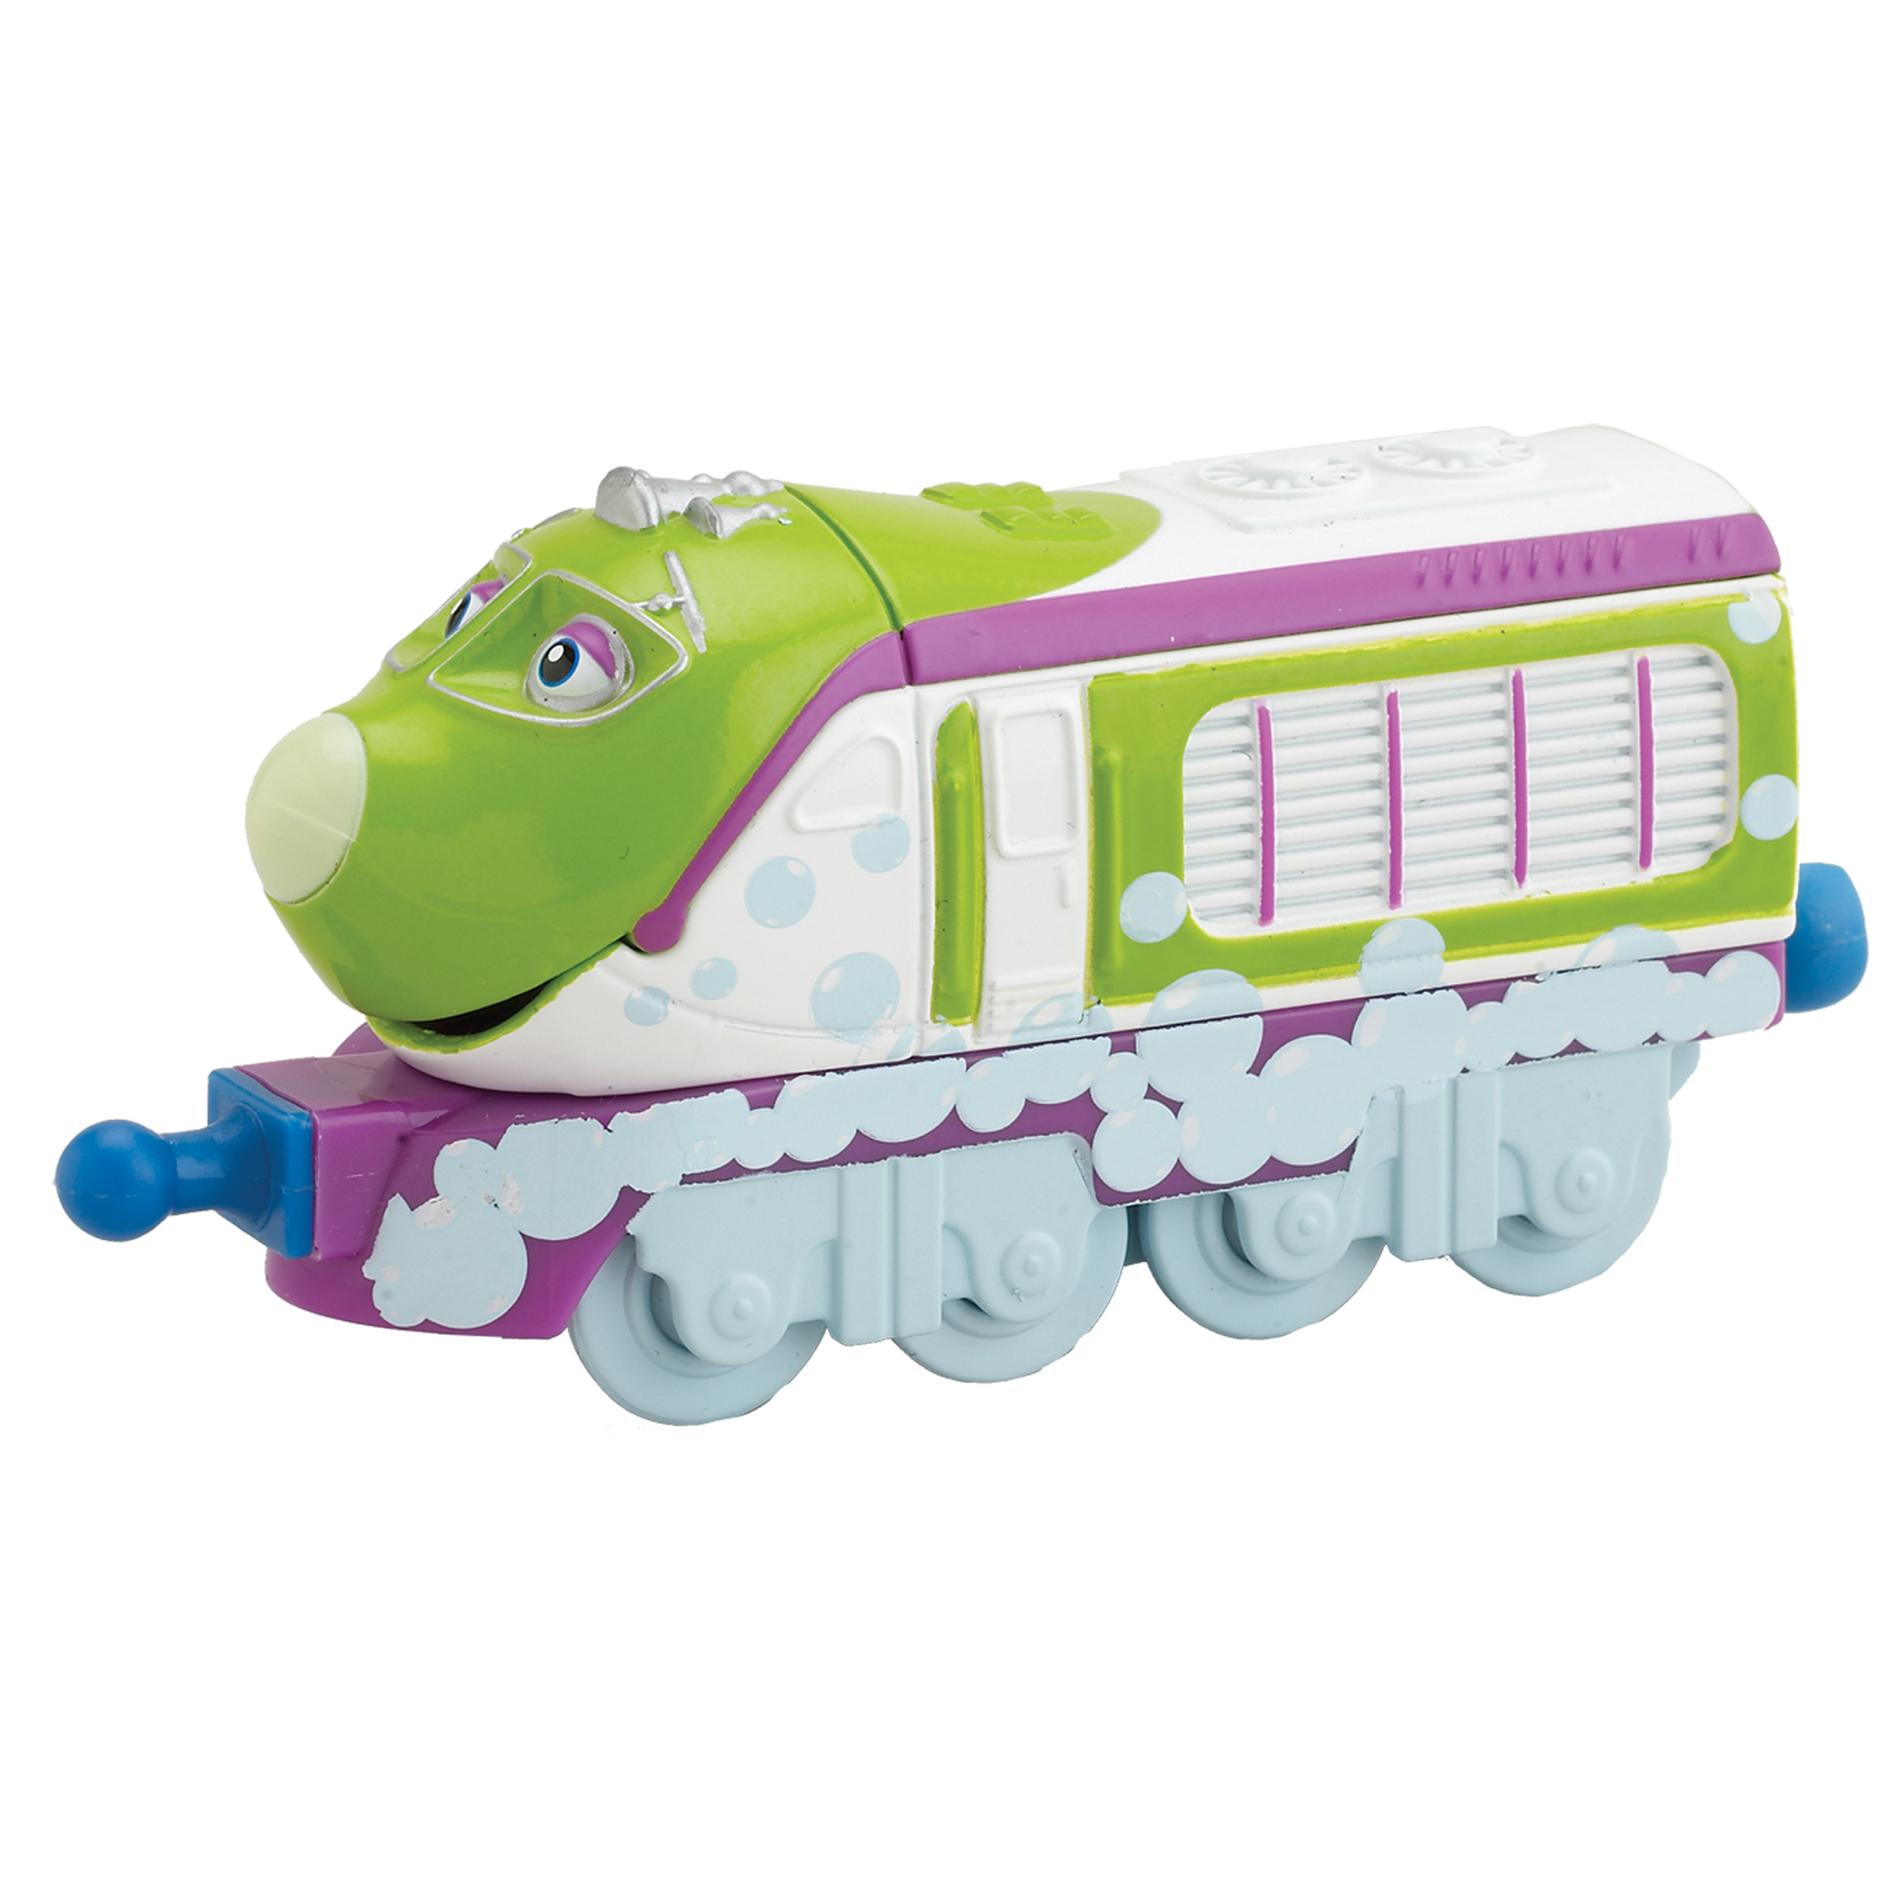 Chuggington Die-Cast Soap Suds Koko Toy Train Car